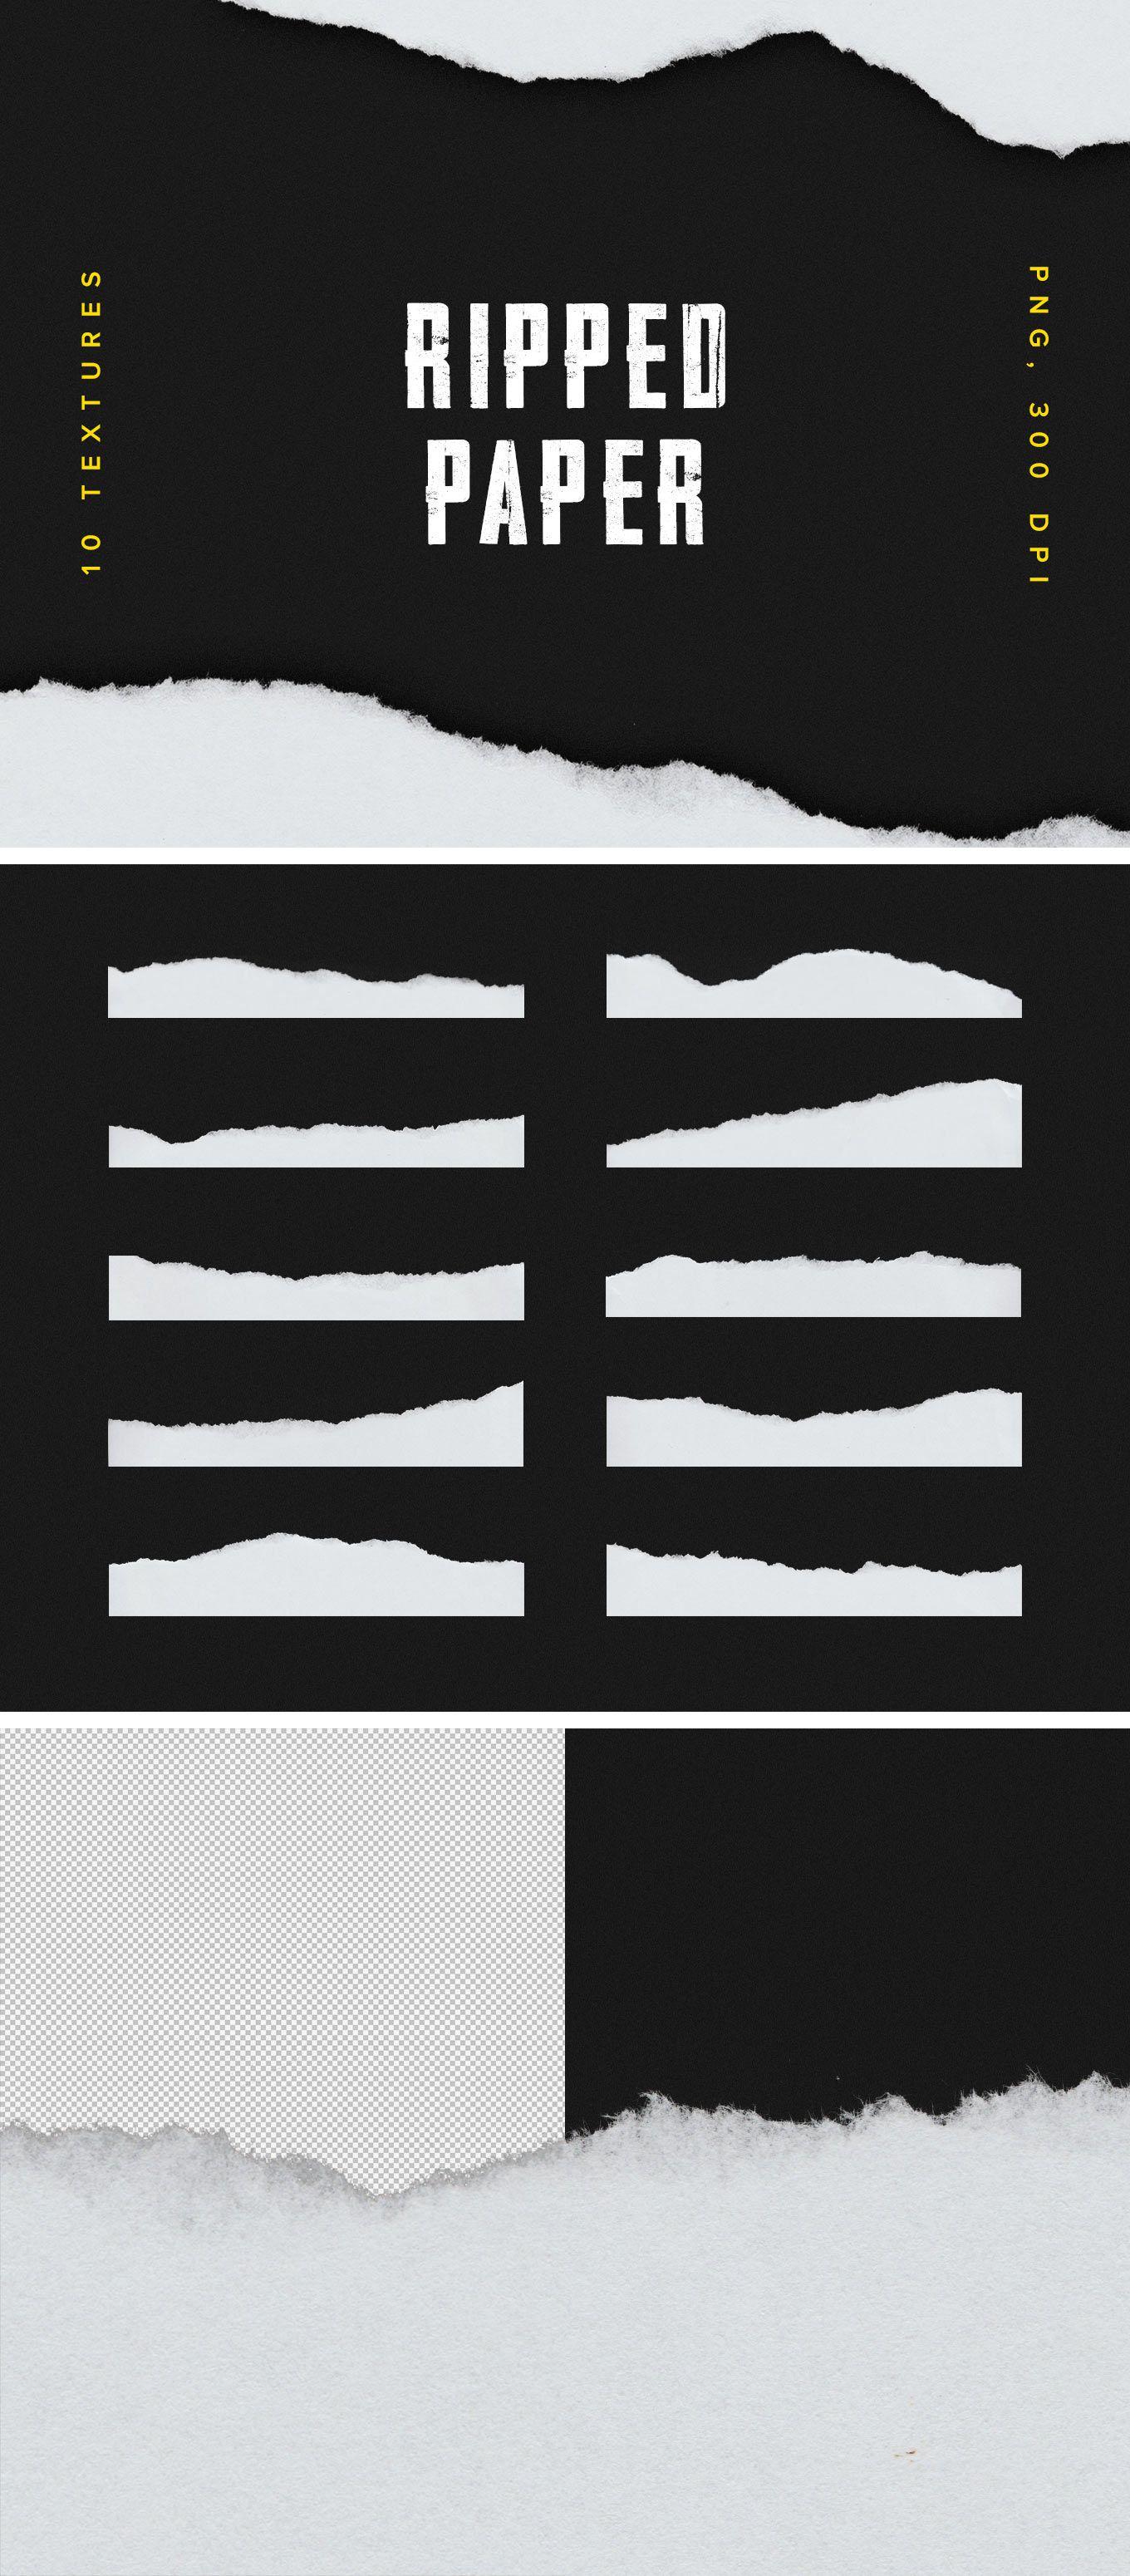 Ripped Paper Photoshop : ripped, paper, photoshop, Ripped, Paper, Texture, Texture,, Graphic, Design,